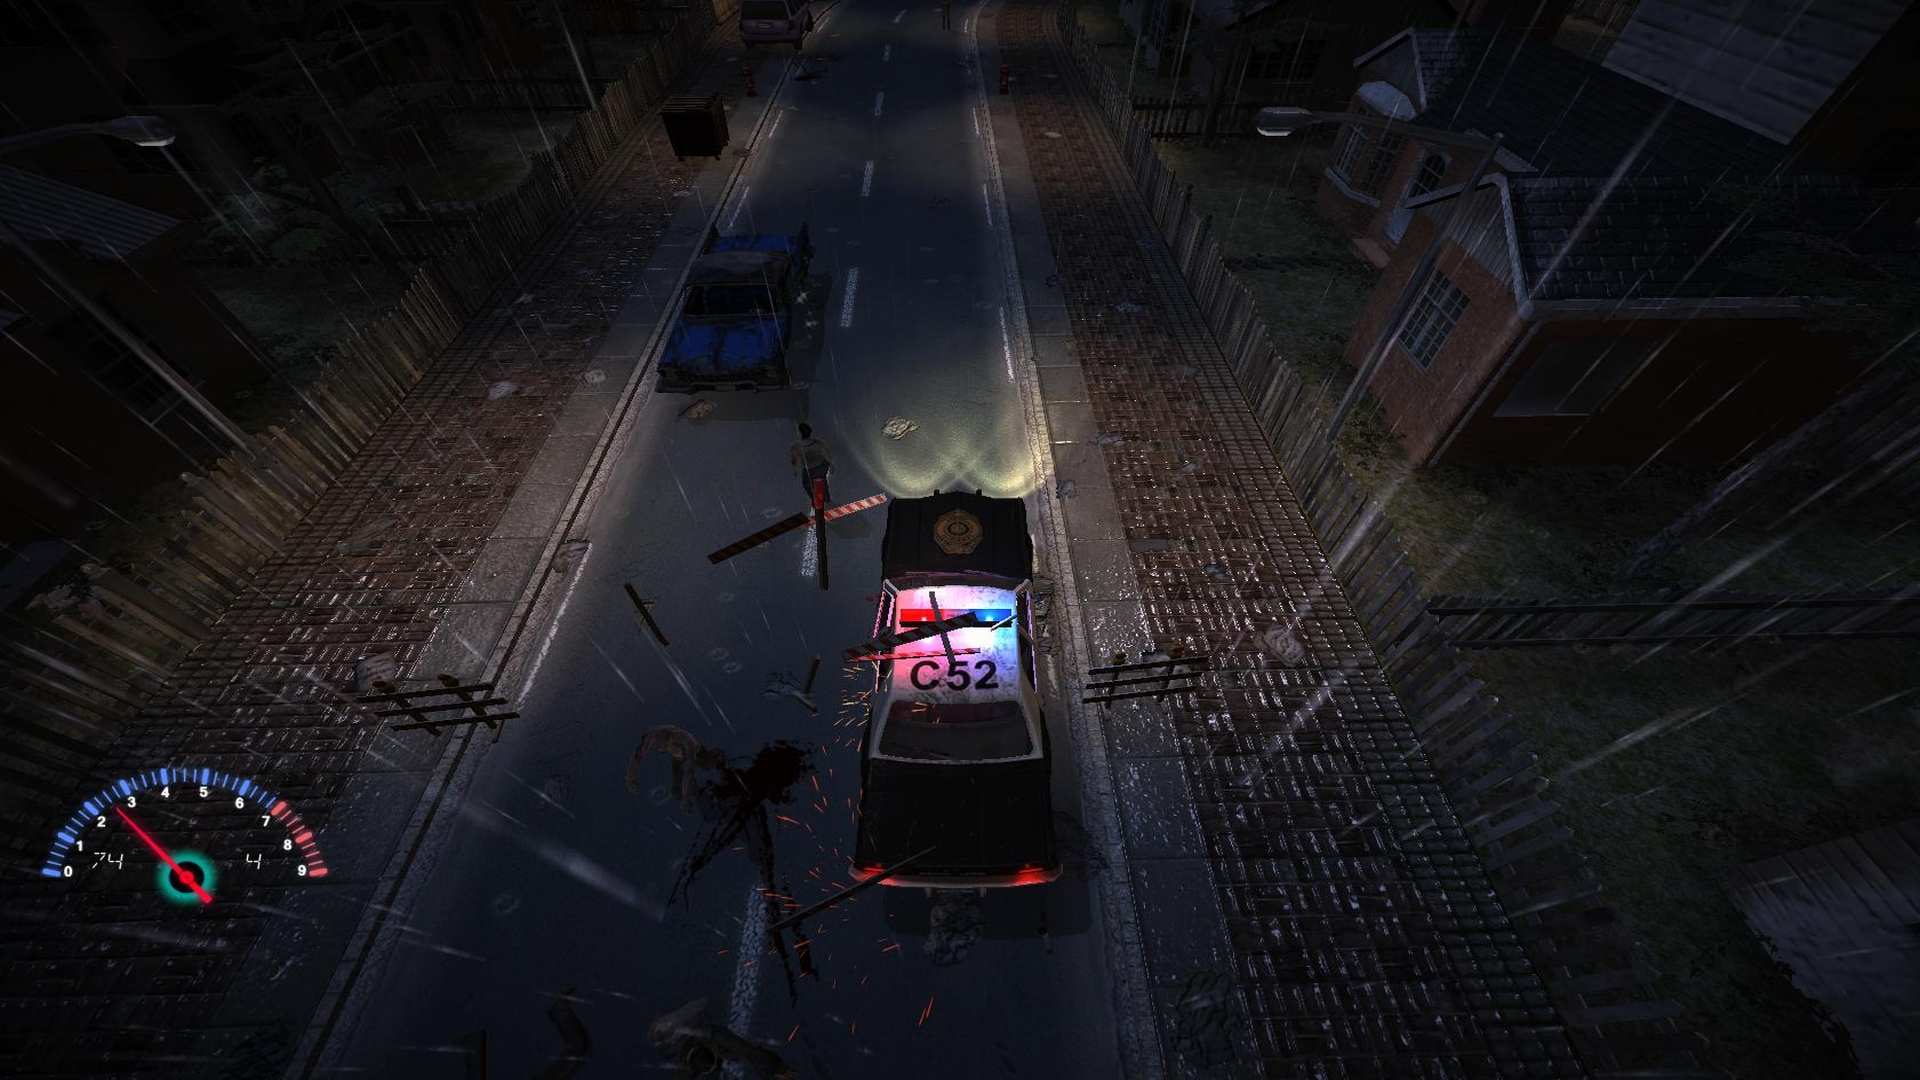 تحميل لعبة Trapped Dead Lockdown-FLT 1.57gb ss_c897a388eabe0b915